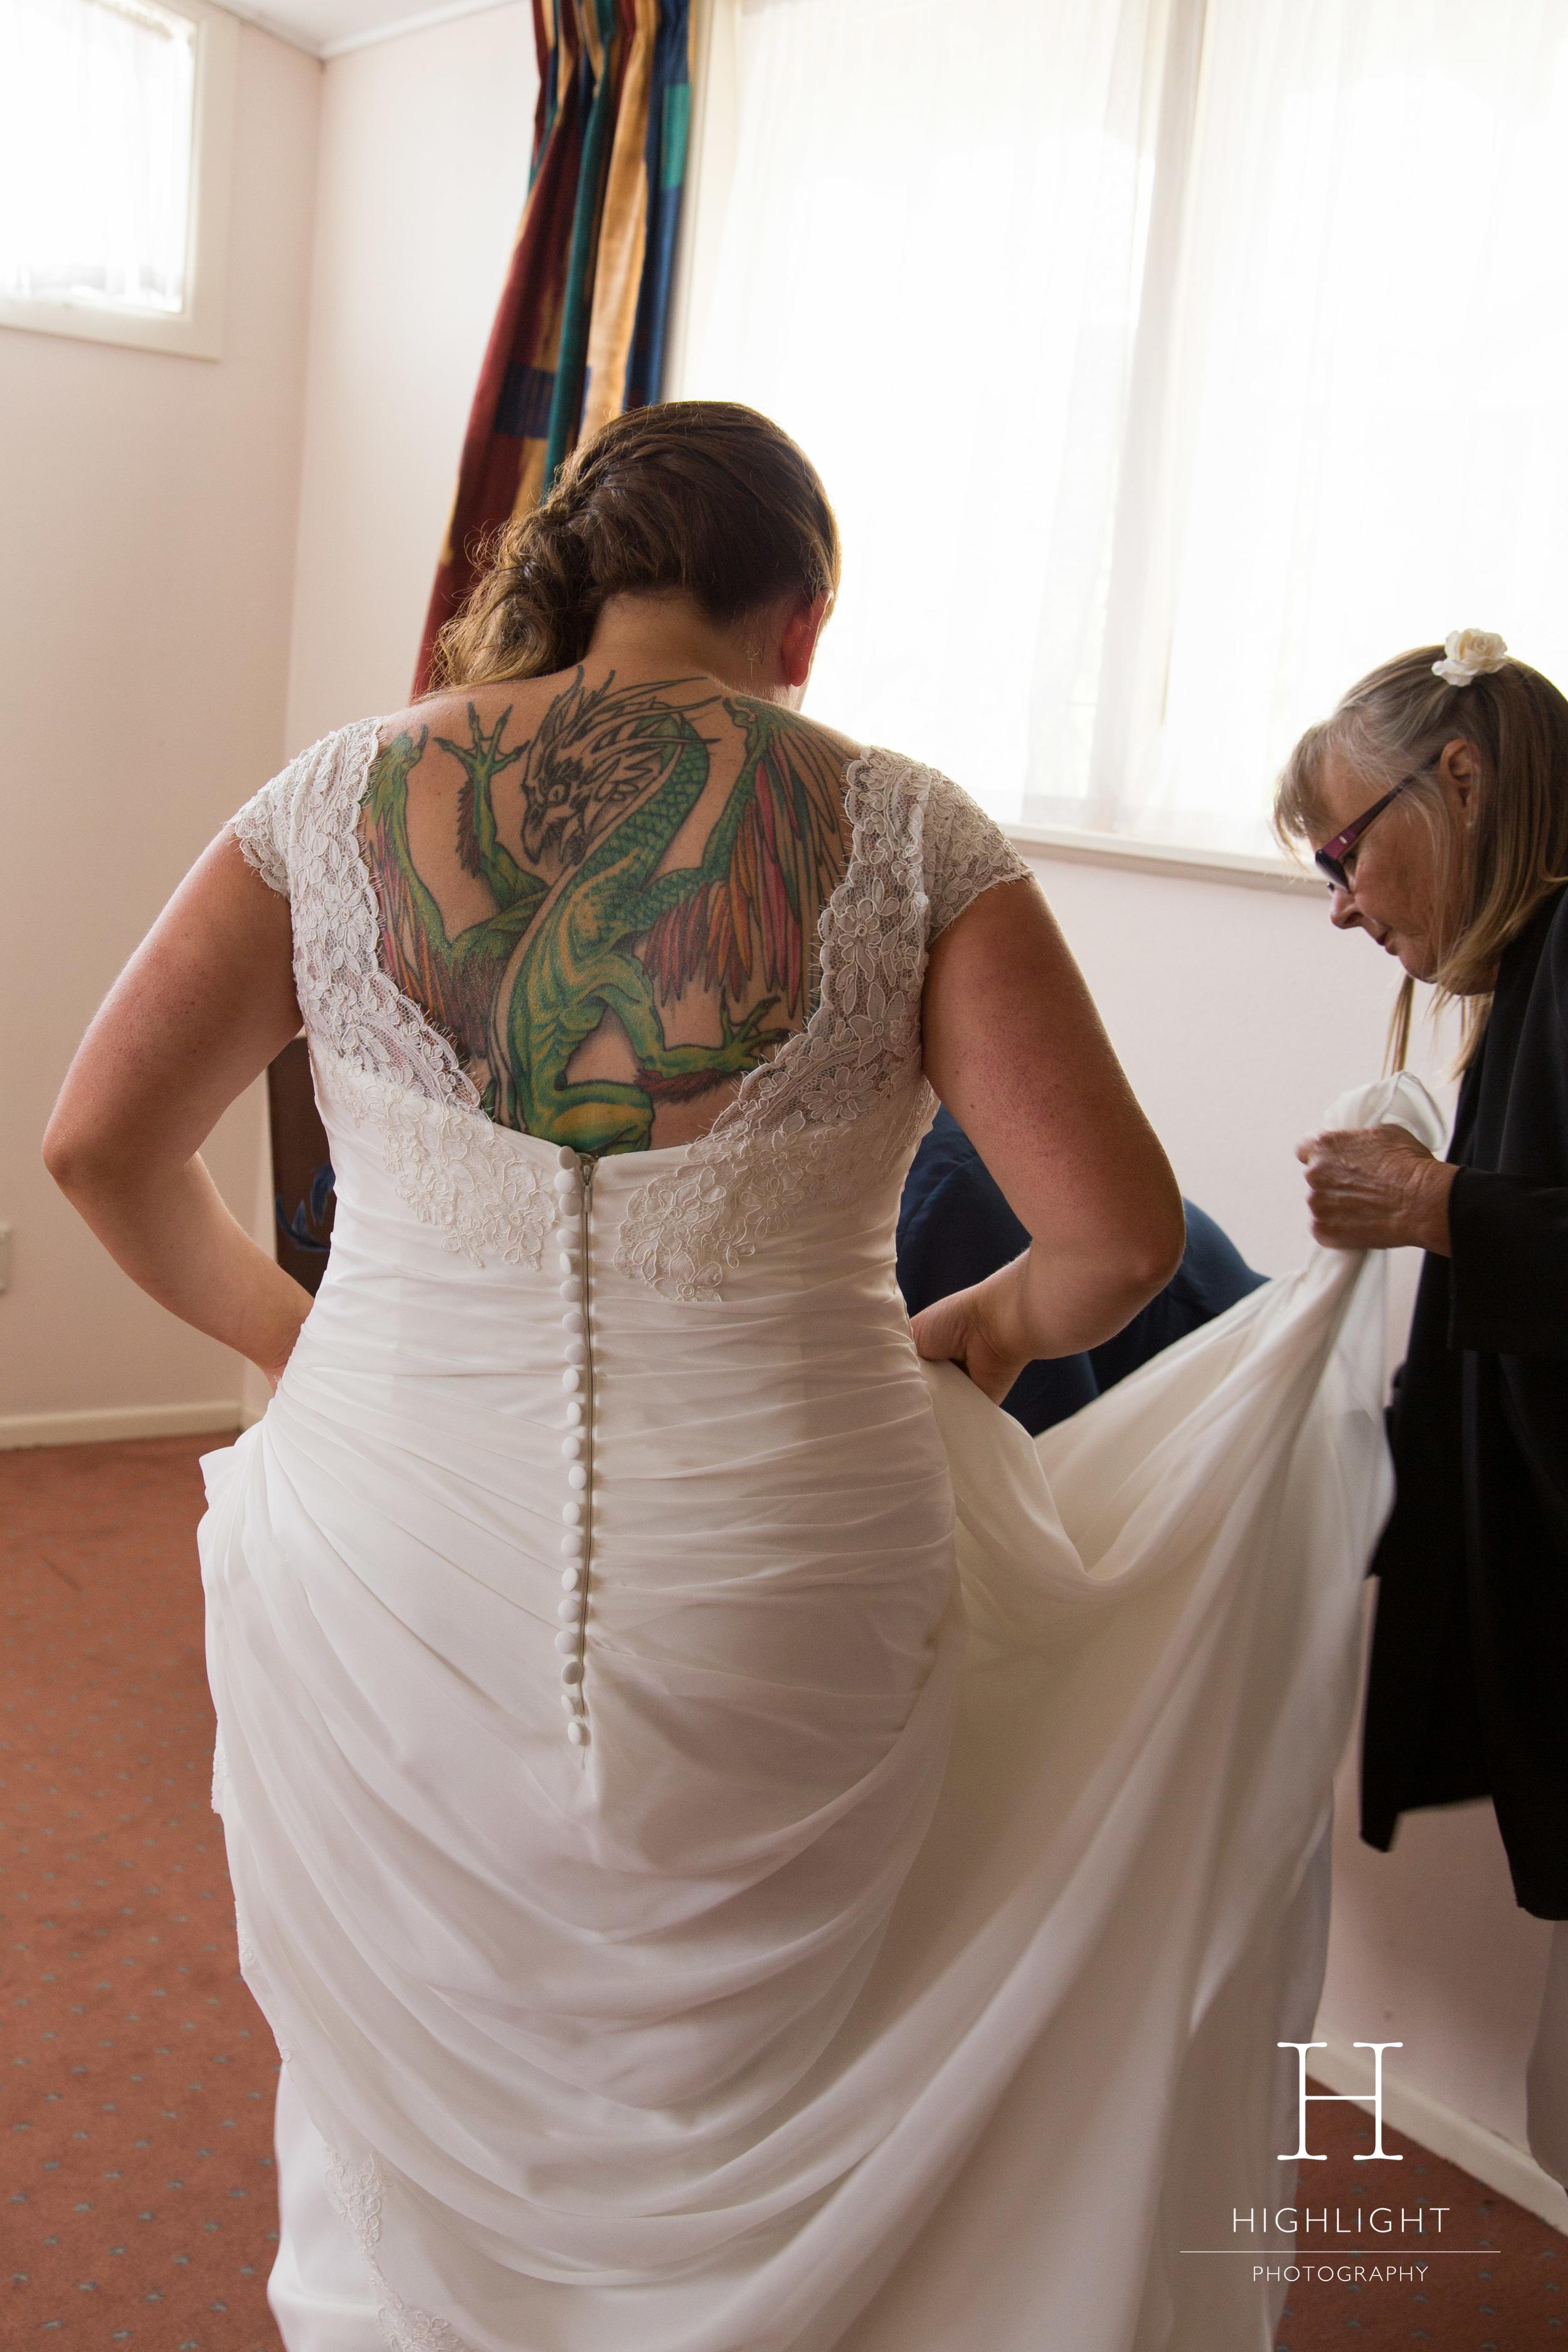 highlight-photography-nz-wedding-bride.jpg